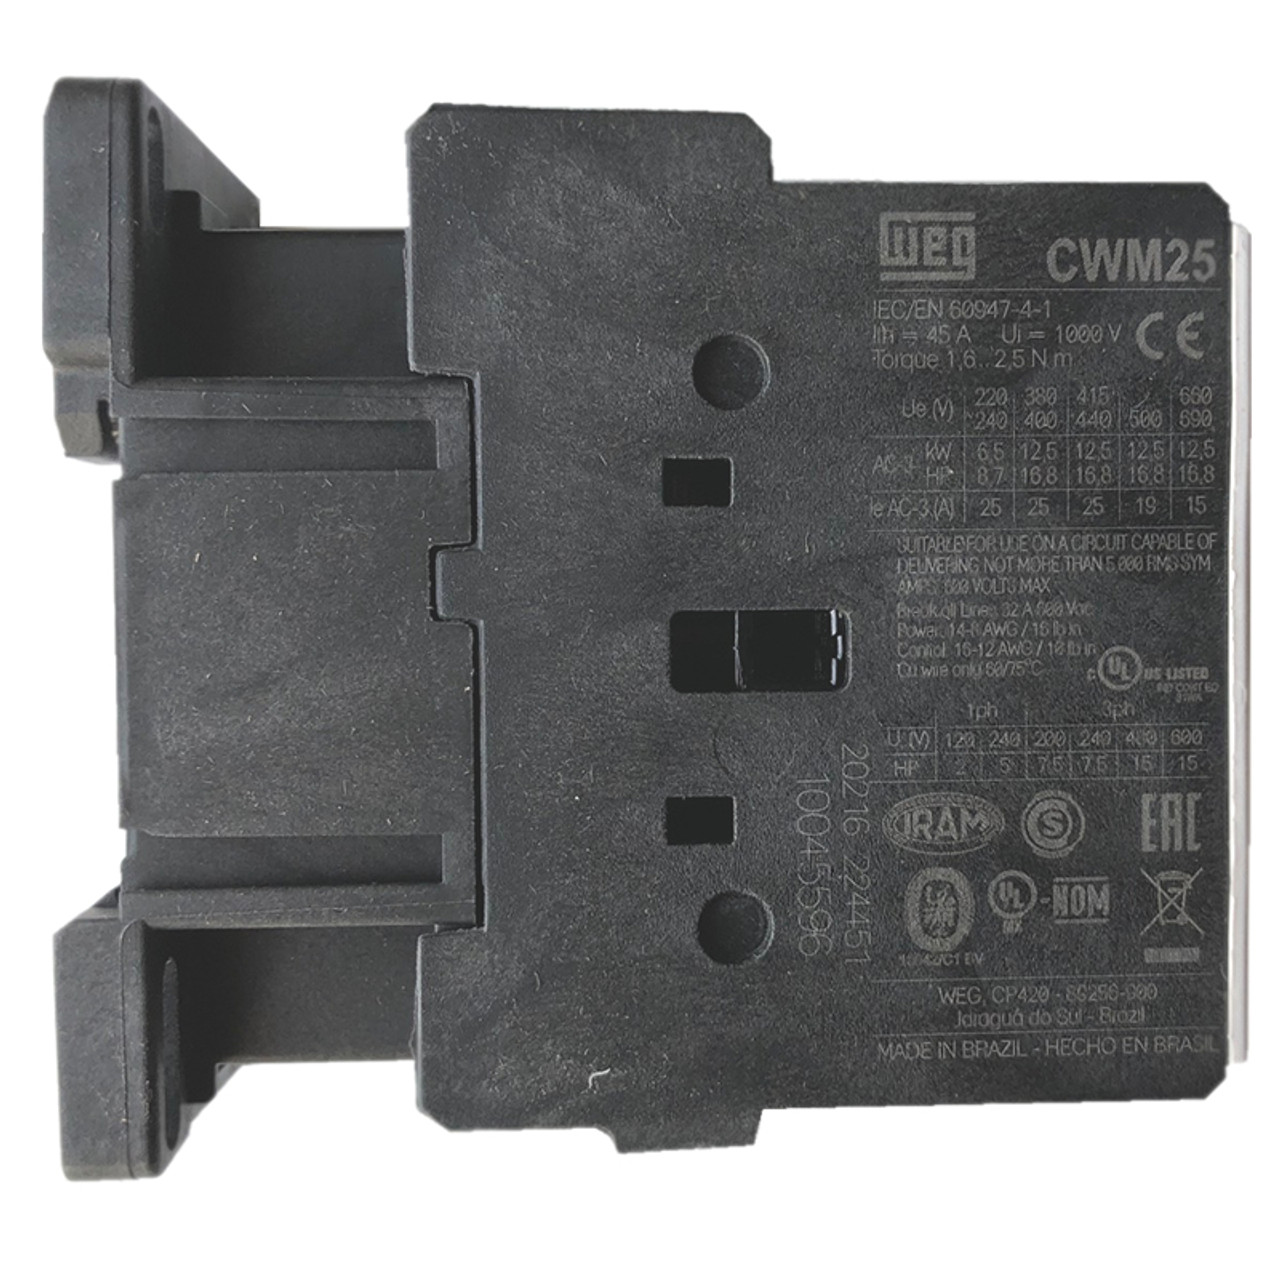 WEG CWM25-00-30V24 side label